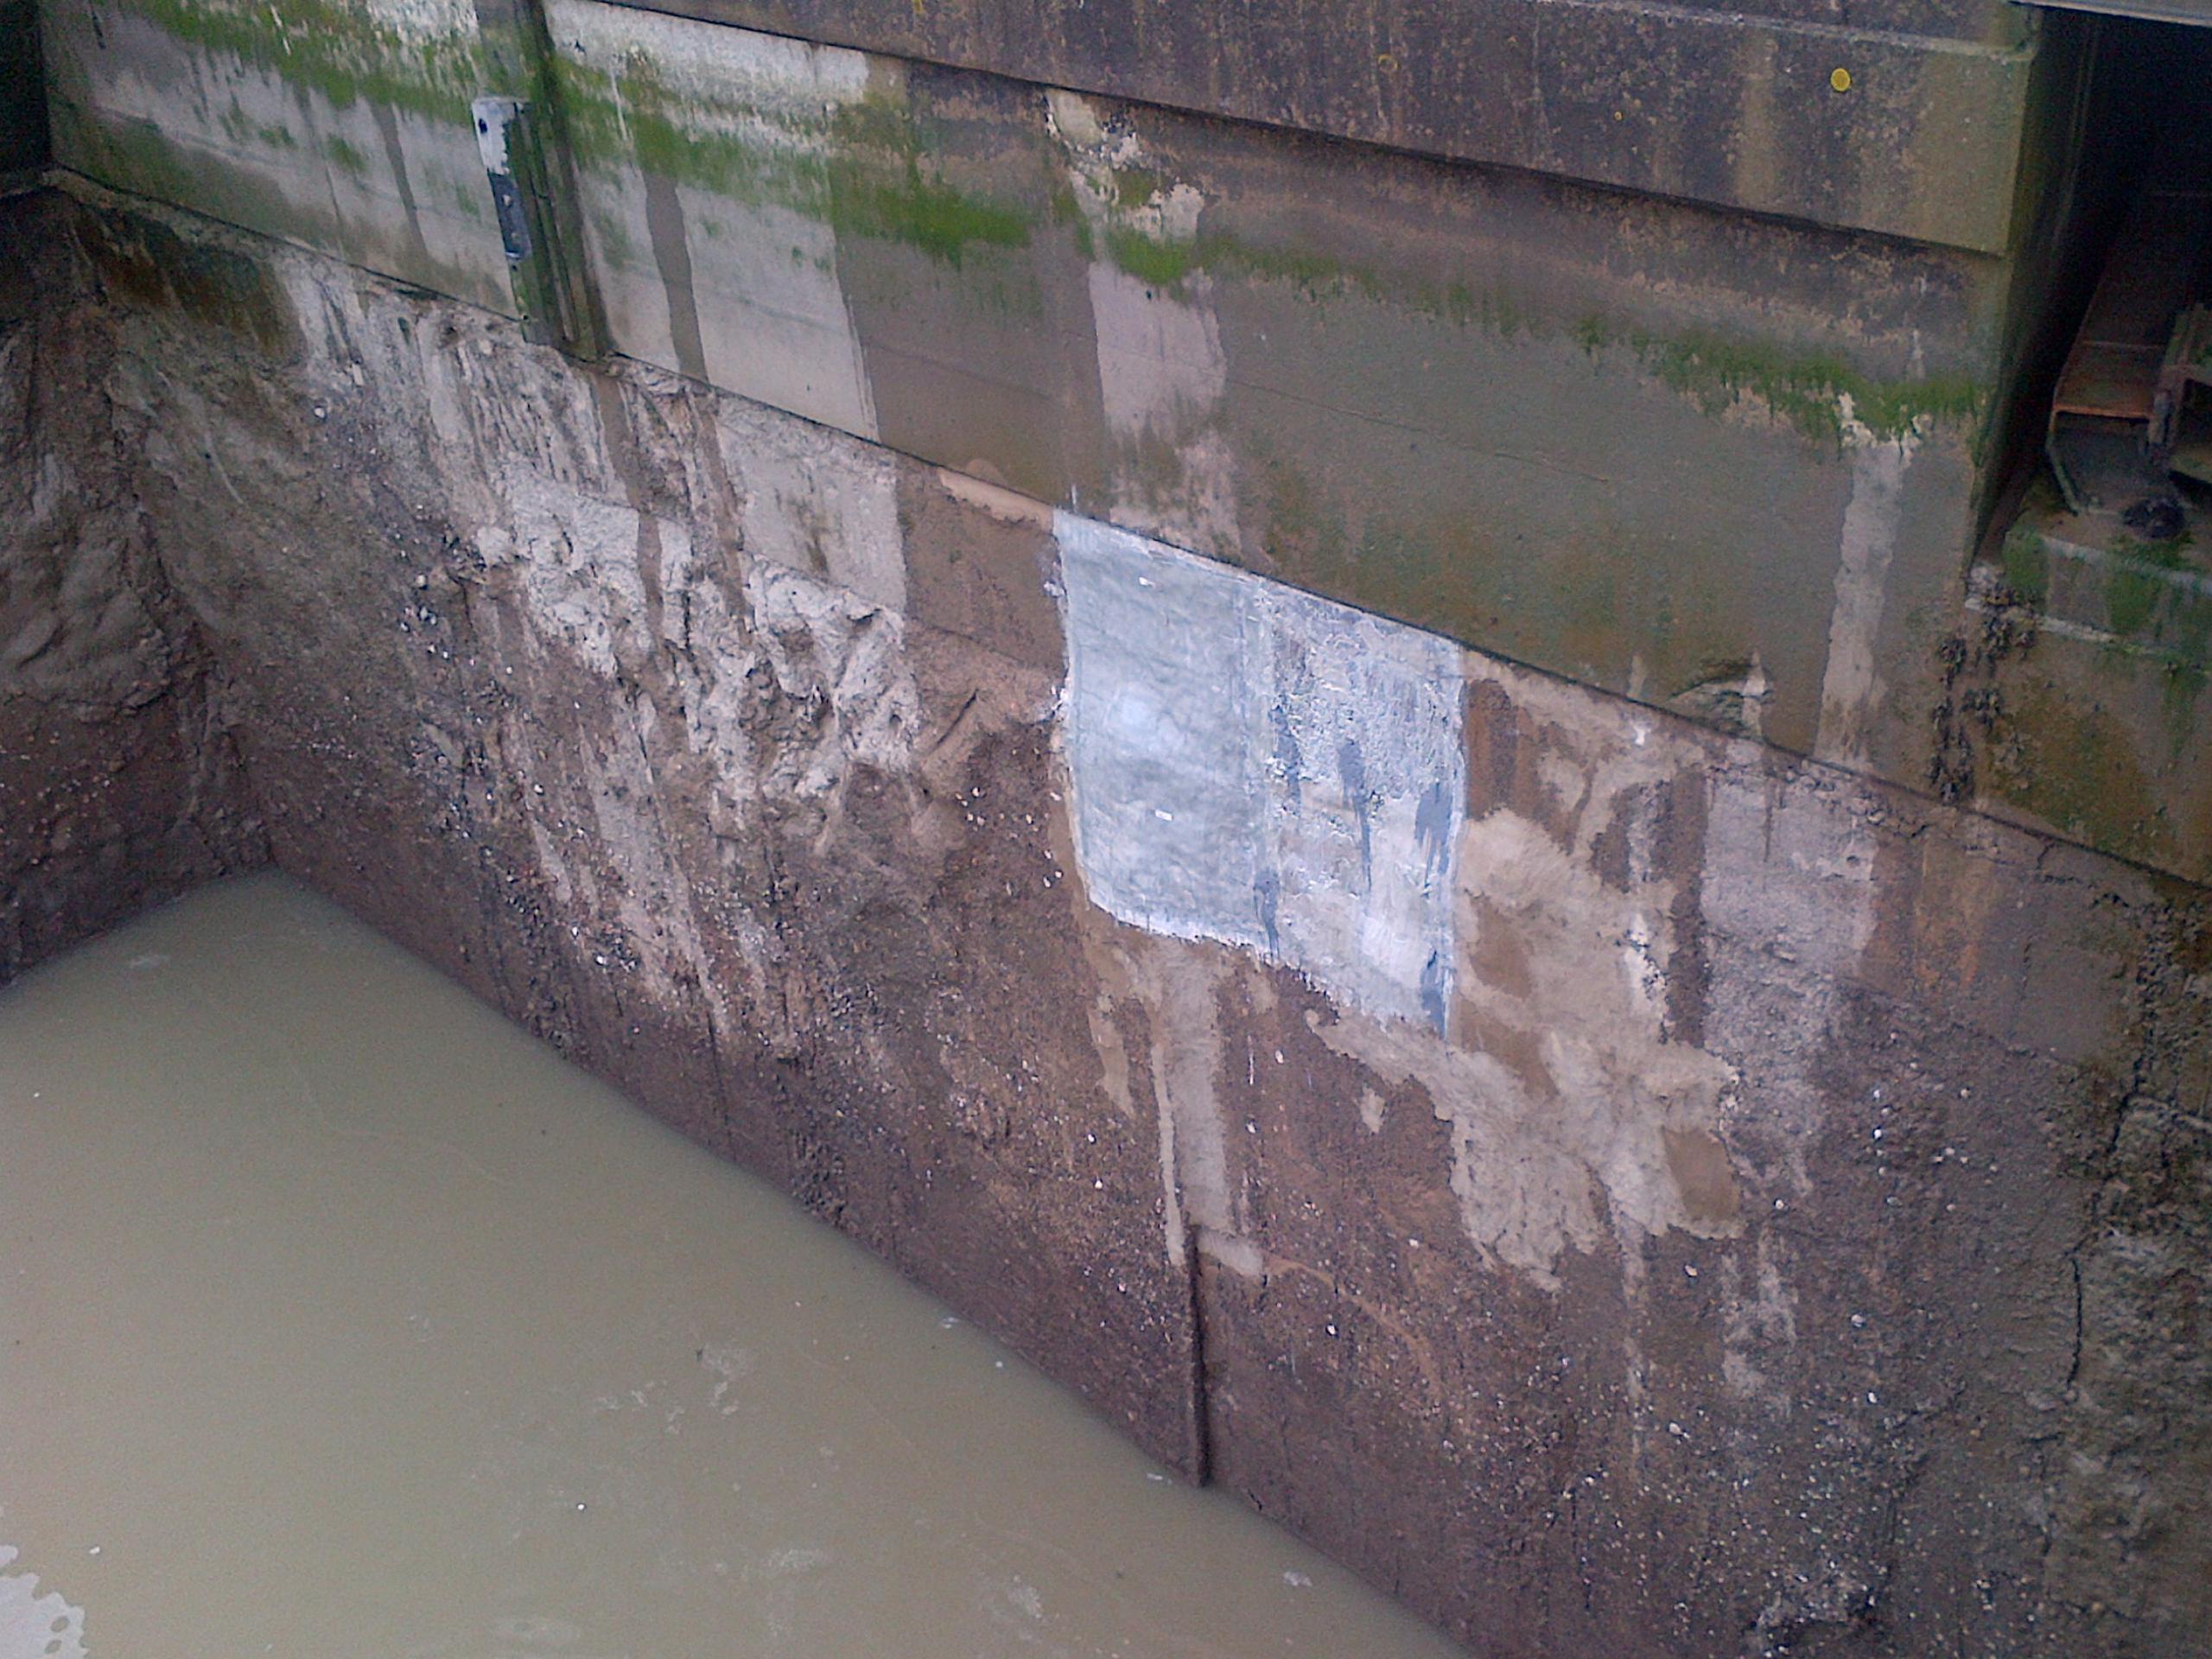 Concrete Repairs and Erosion Prevention – Stub Pier